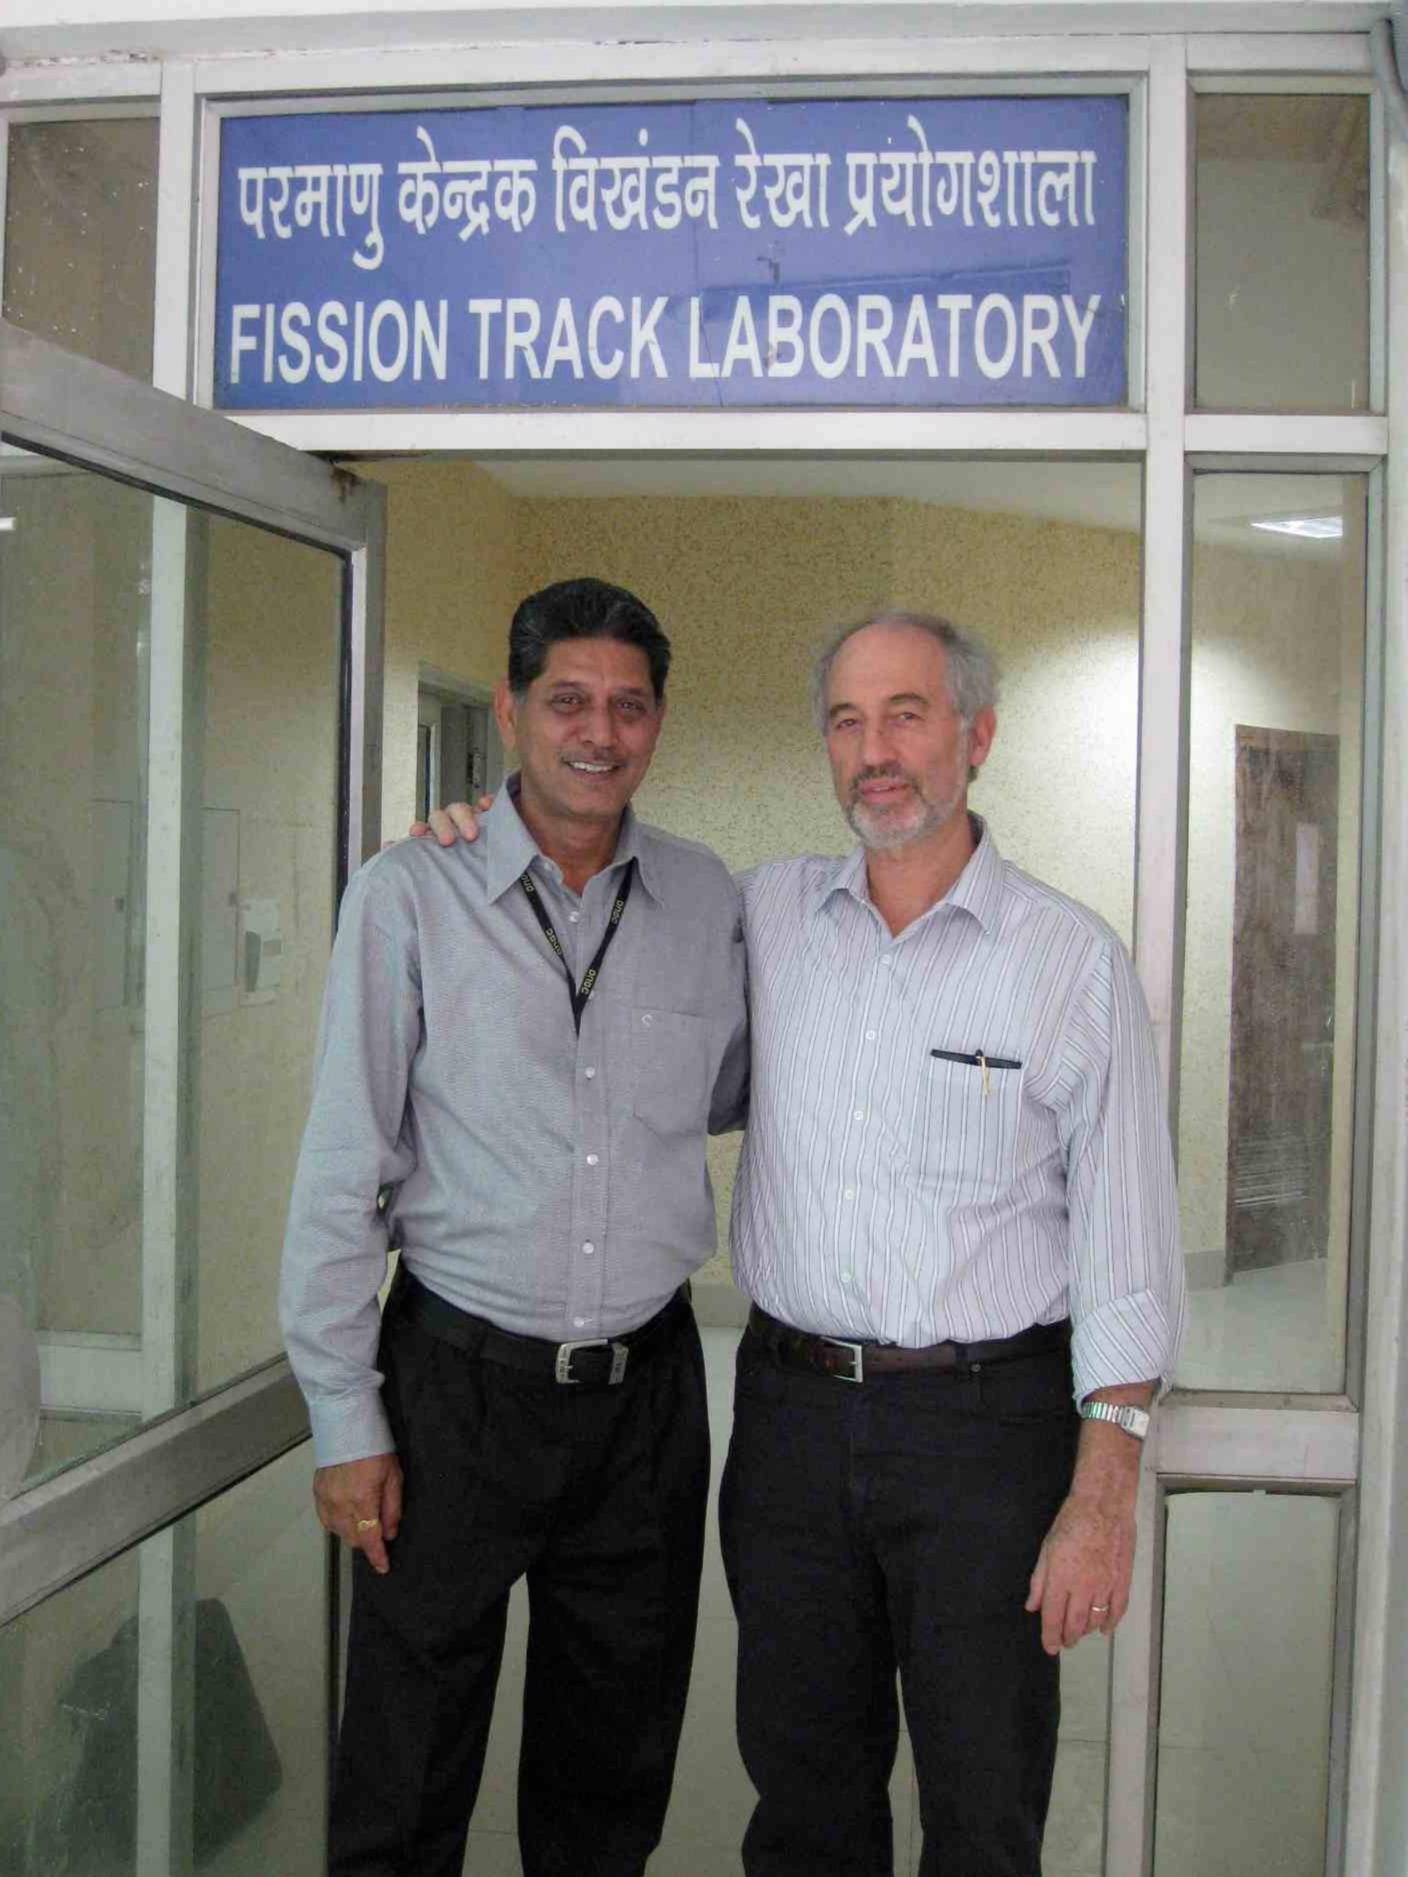 ONGC visit, 2010